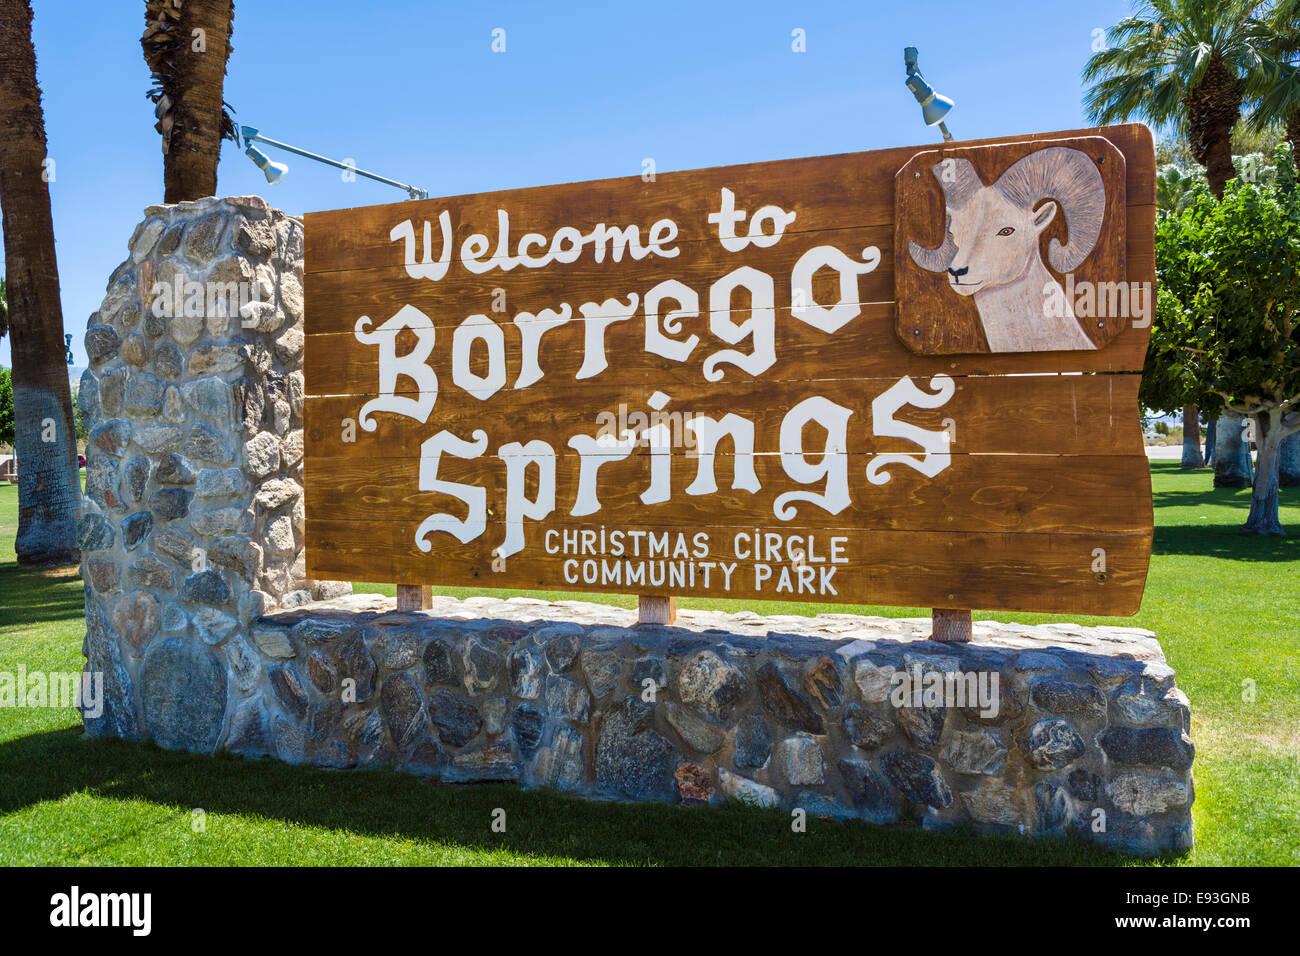 Welcome to Borrego Springs sign, Anza-Borrego Desert State Park, Southern California, USA - Stock Image